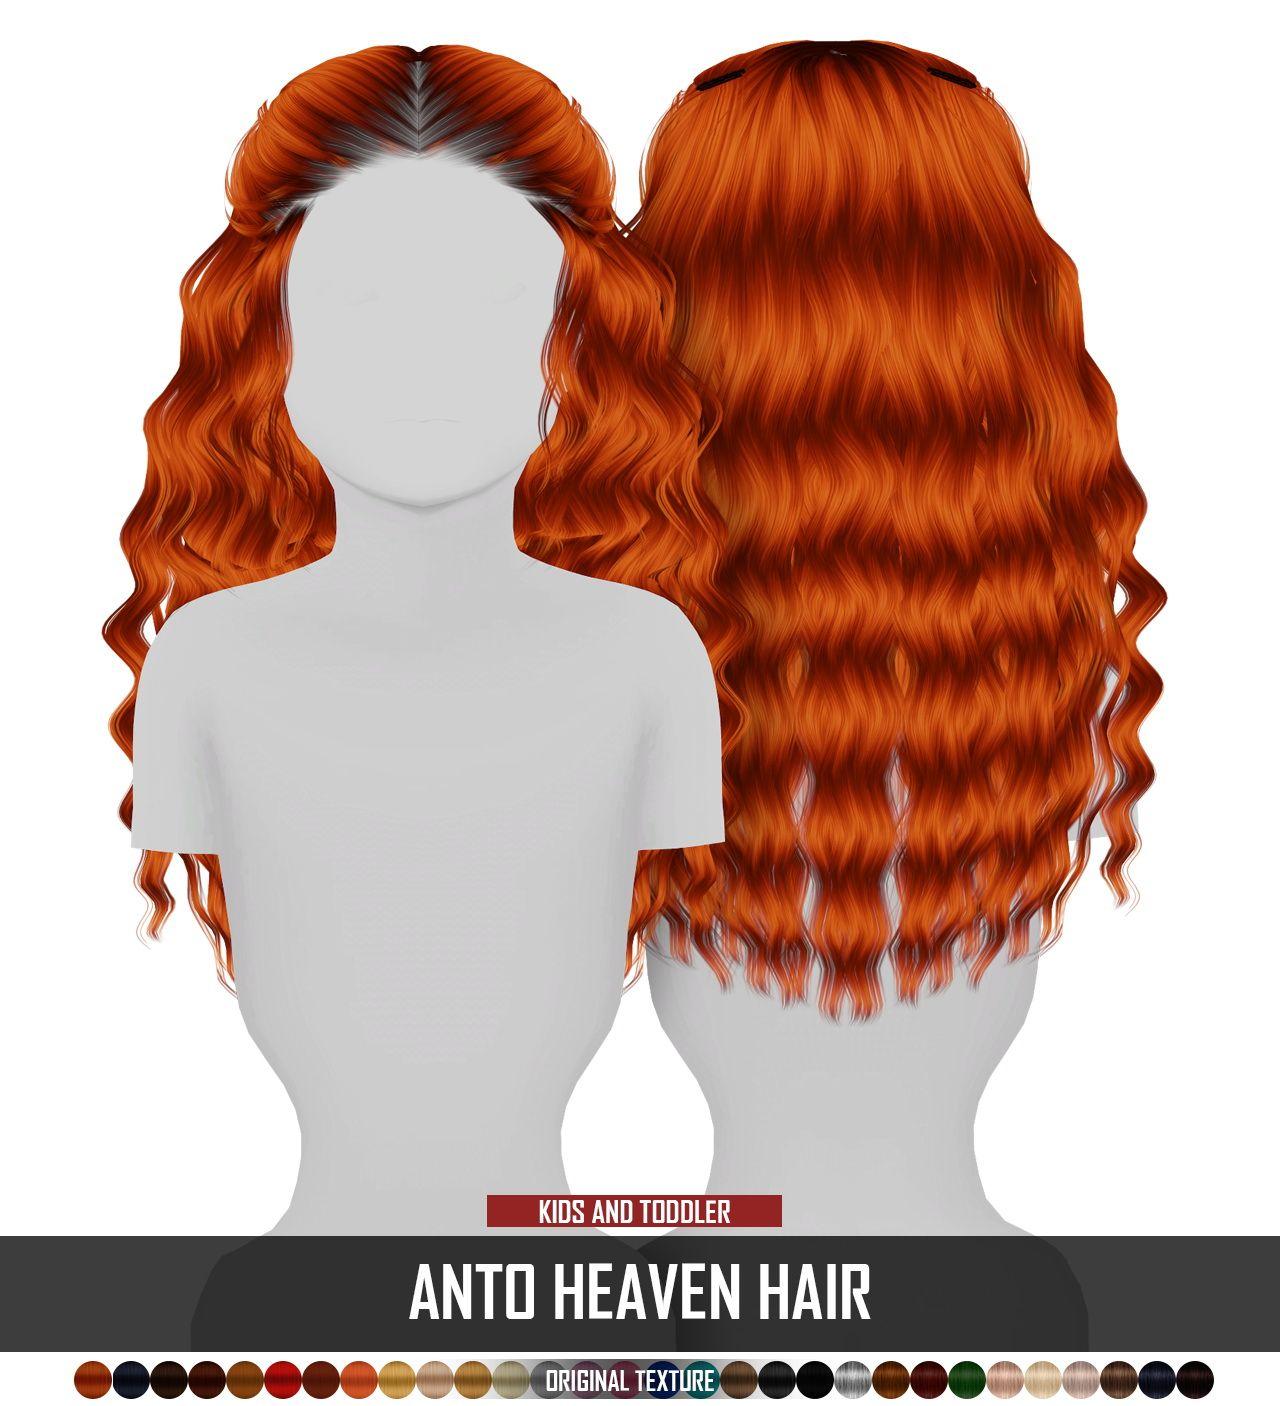 Coupure Electrique Antos Heaven Hair Retextured Kids And